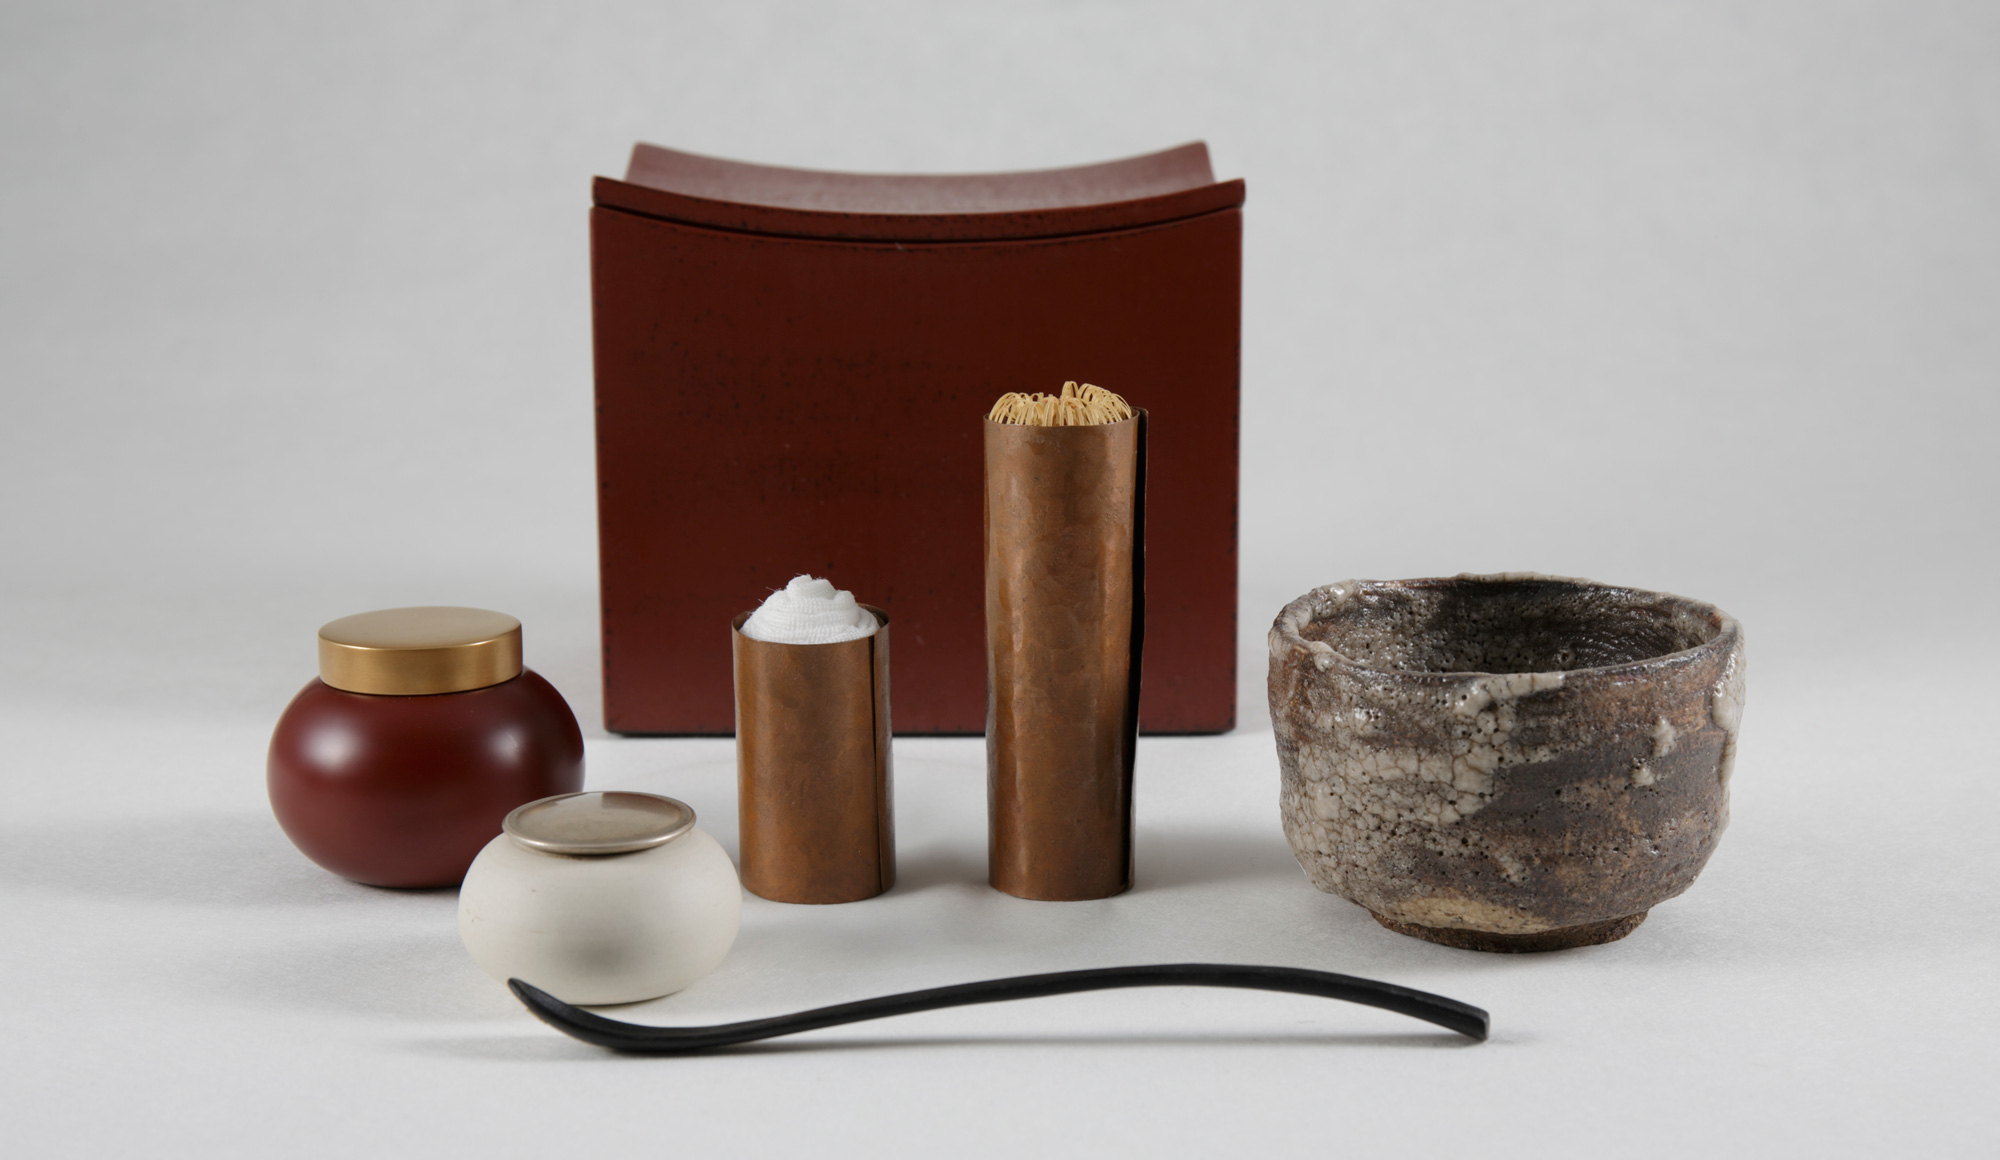 赤木明登 茶の箱展